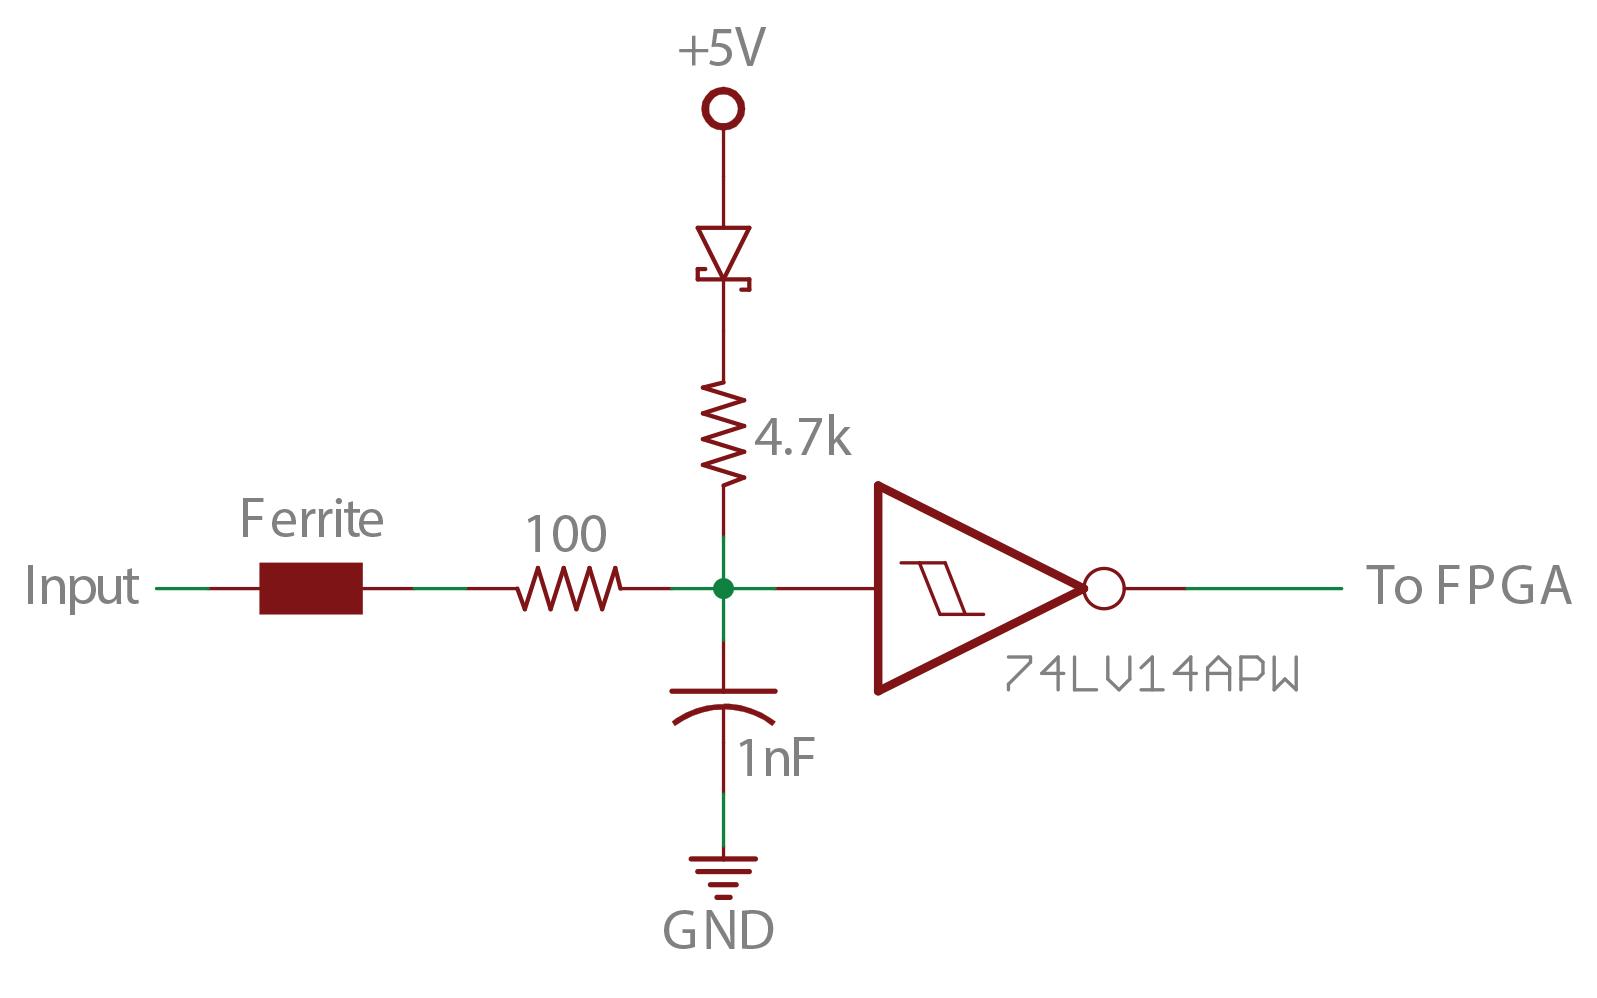 hight resolution of 2004 mustang mach 1 wiring diagram imageresizertool com 2004 mustang mach 1 fuse box diagram 2004 mustang mach 1 fuse box diagram